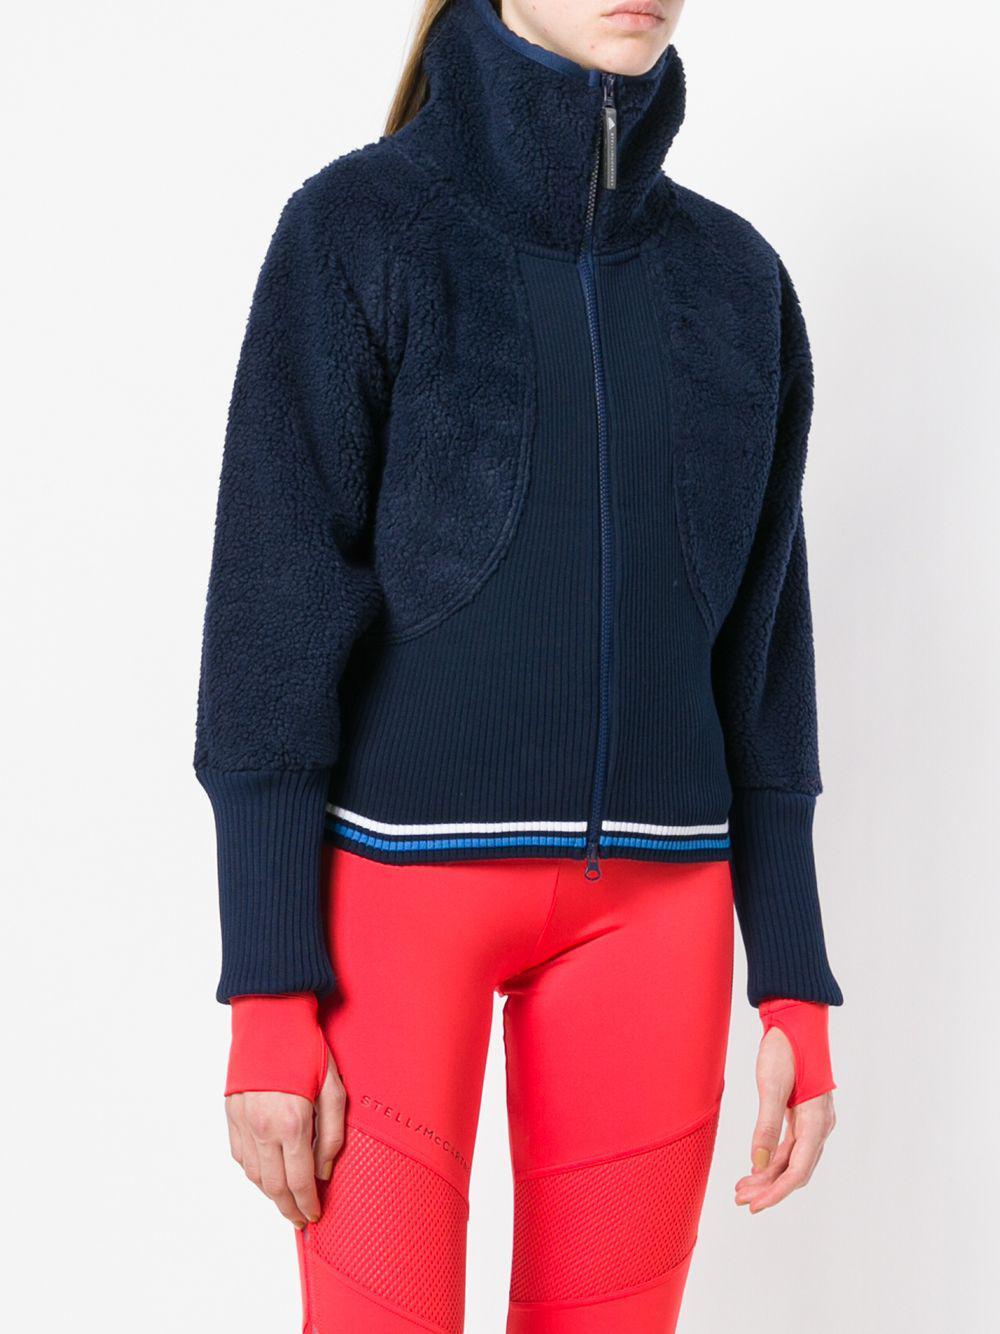 reputable site 32618 2bd05 adidas By Stella McCartney Ribbed Teddy Track Jacket in Blue - Lyst